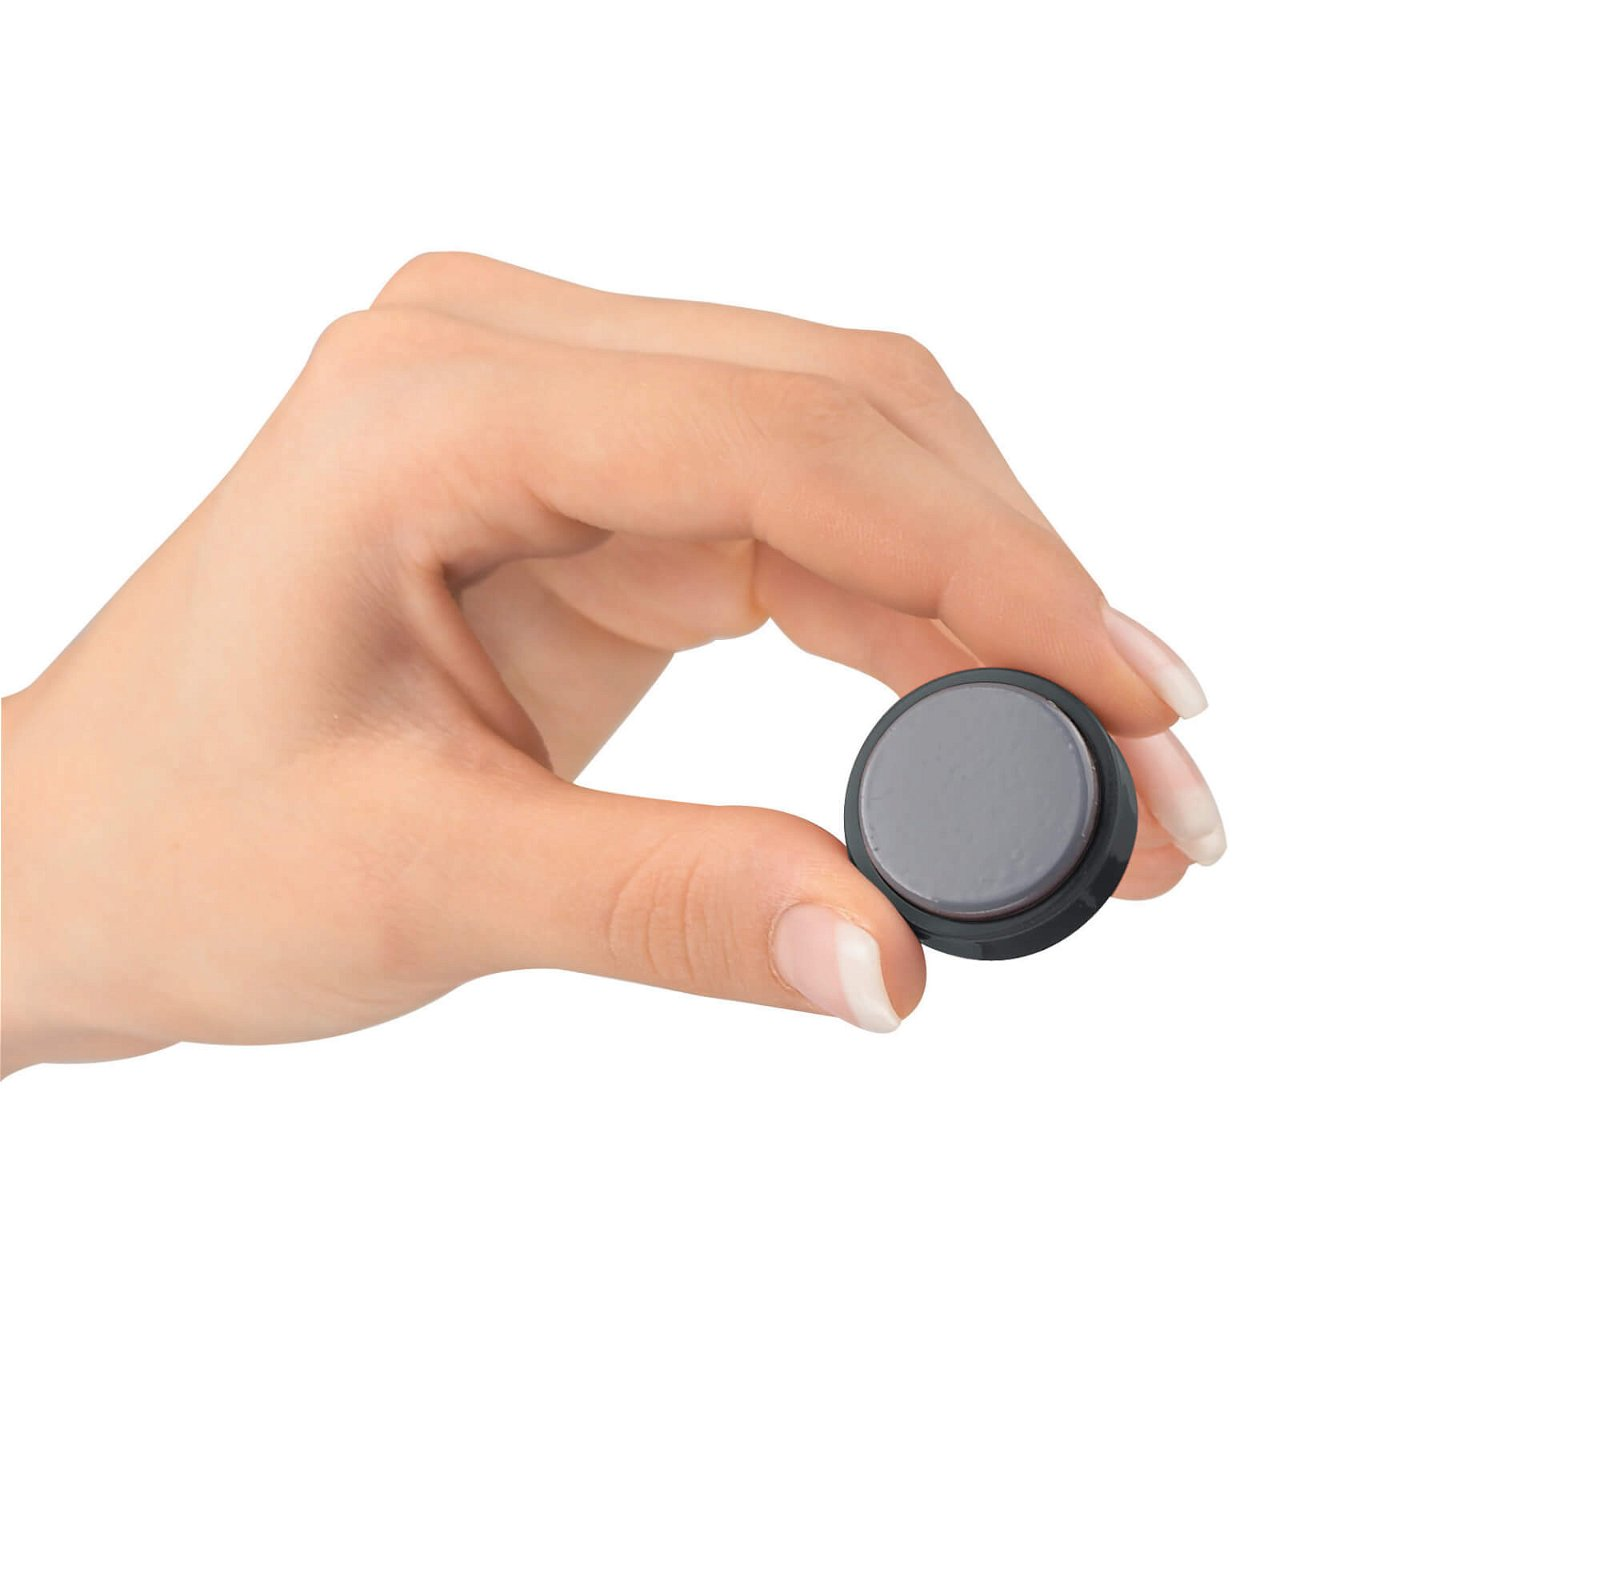 Facetterand-Magnet MAULpro Ø 30 mm, 0,6 kg, 20 St./Set, schwarz